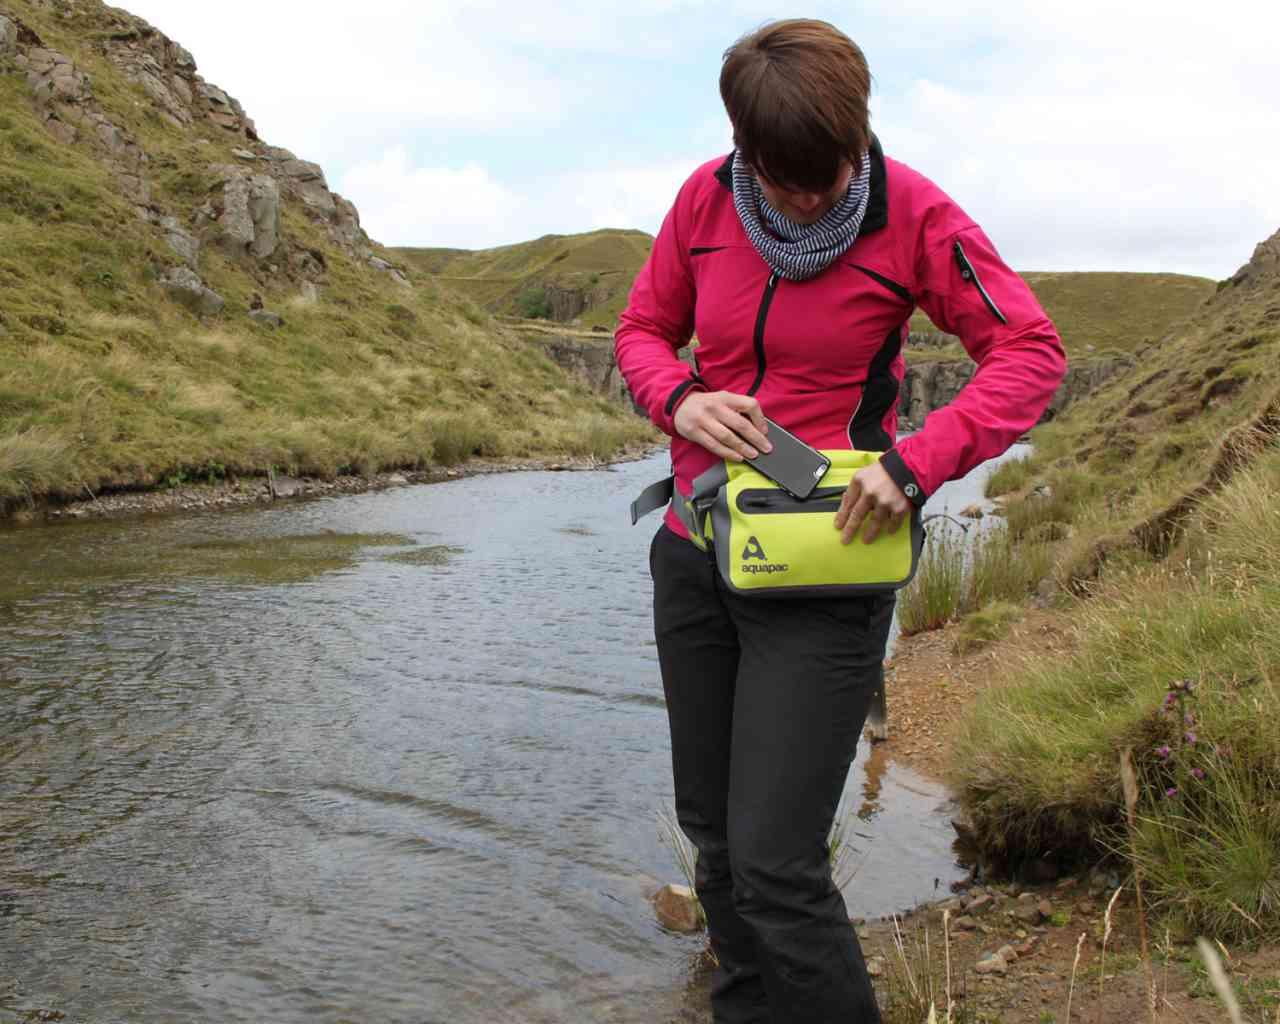 Водонепроницаемый чехол для документов - Aquapac 821. Aquapac - №1 в мире водонепроницаемых чехлов и сумок. Фото 7